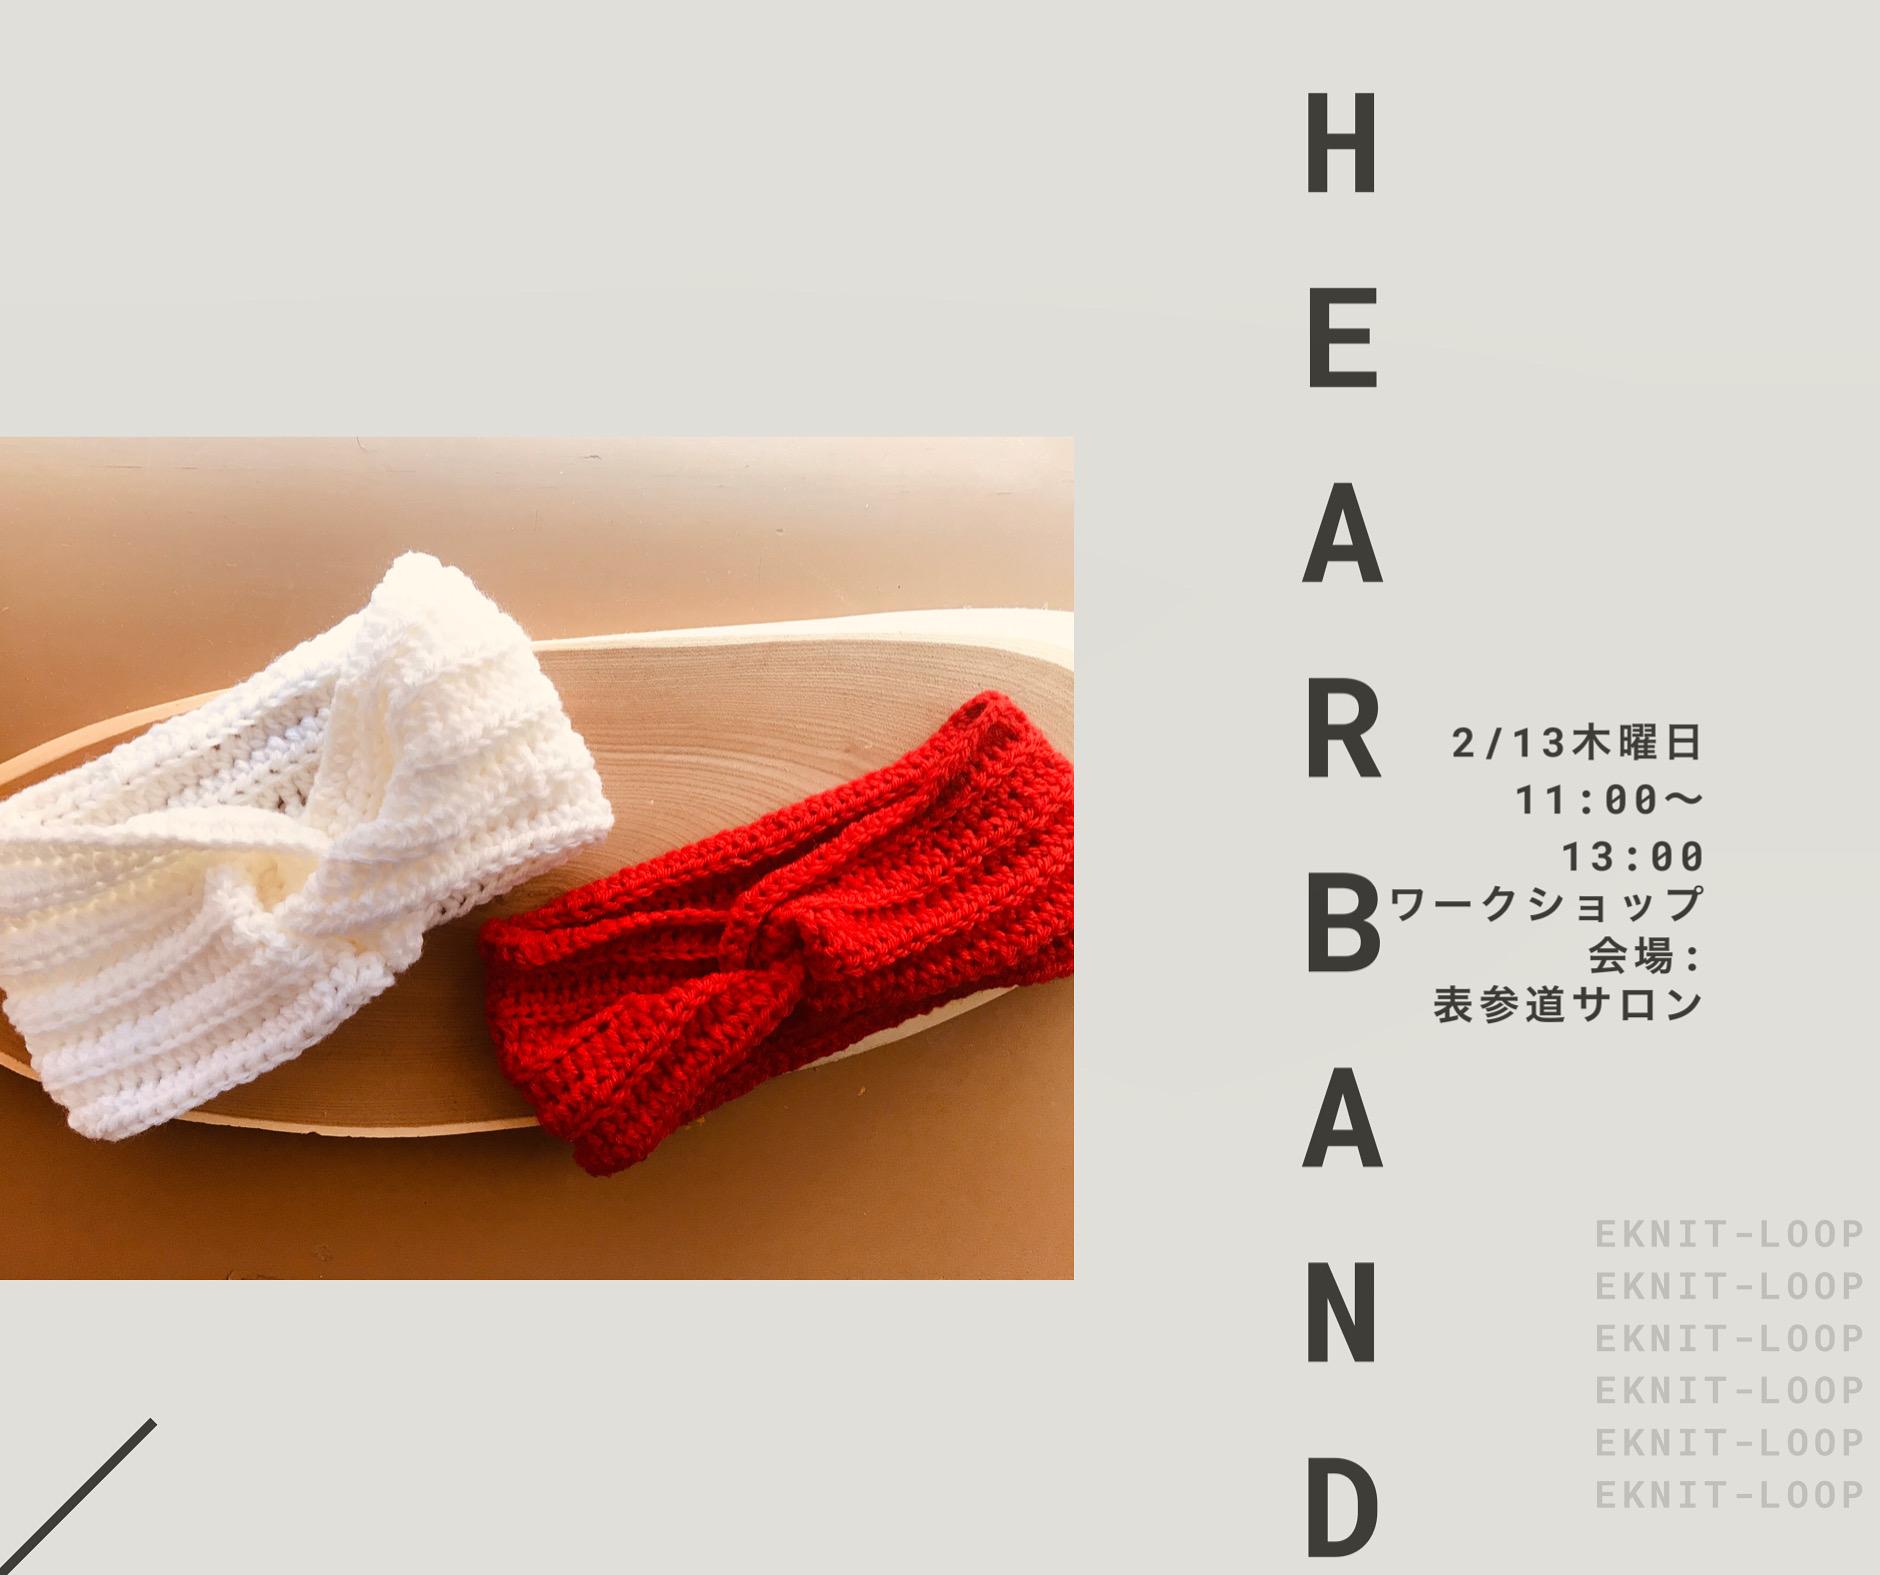 Hear band 編み物ワークショップ募集